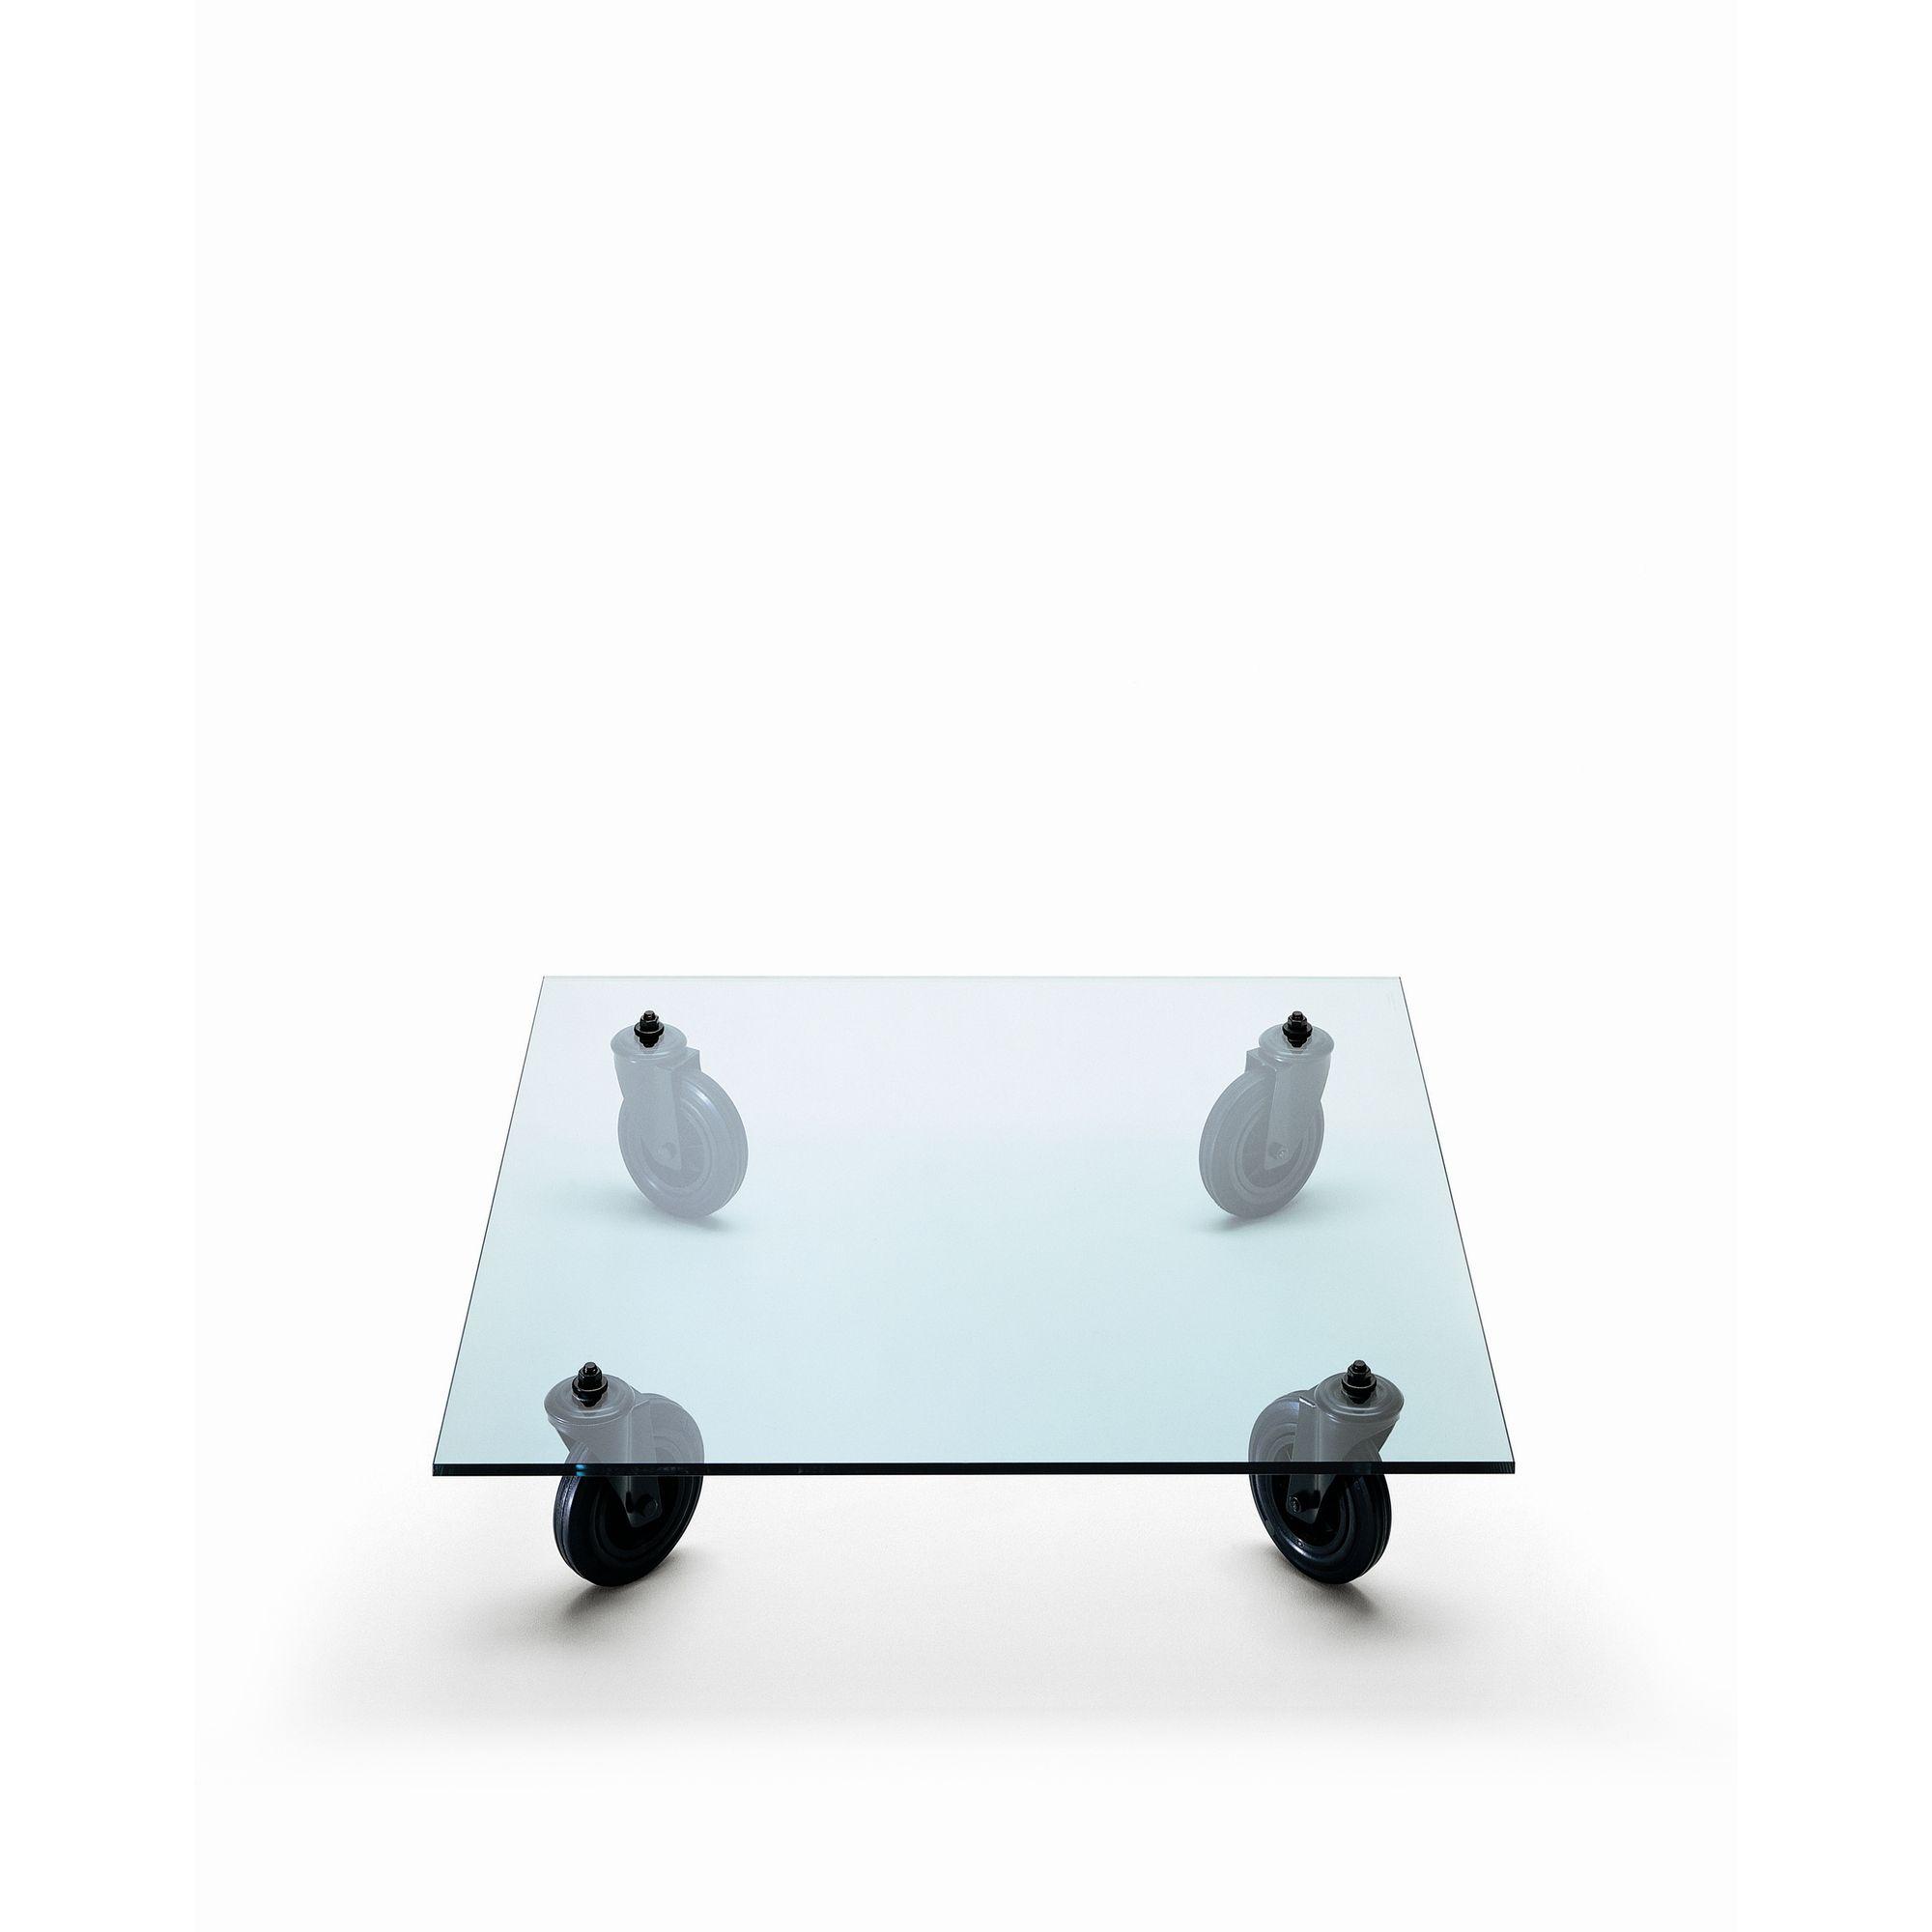 FontanaArte Tavolo Con Route Table - 110cm H X 110cm W X 25cm D at Tesco Direct